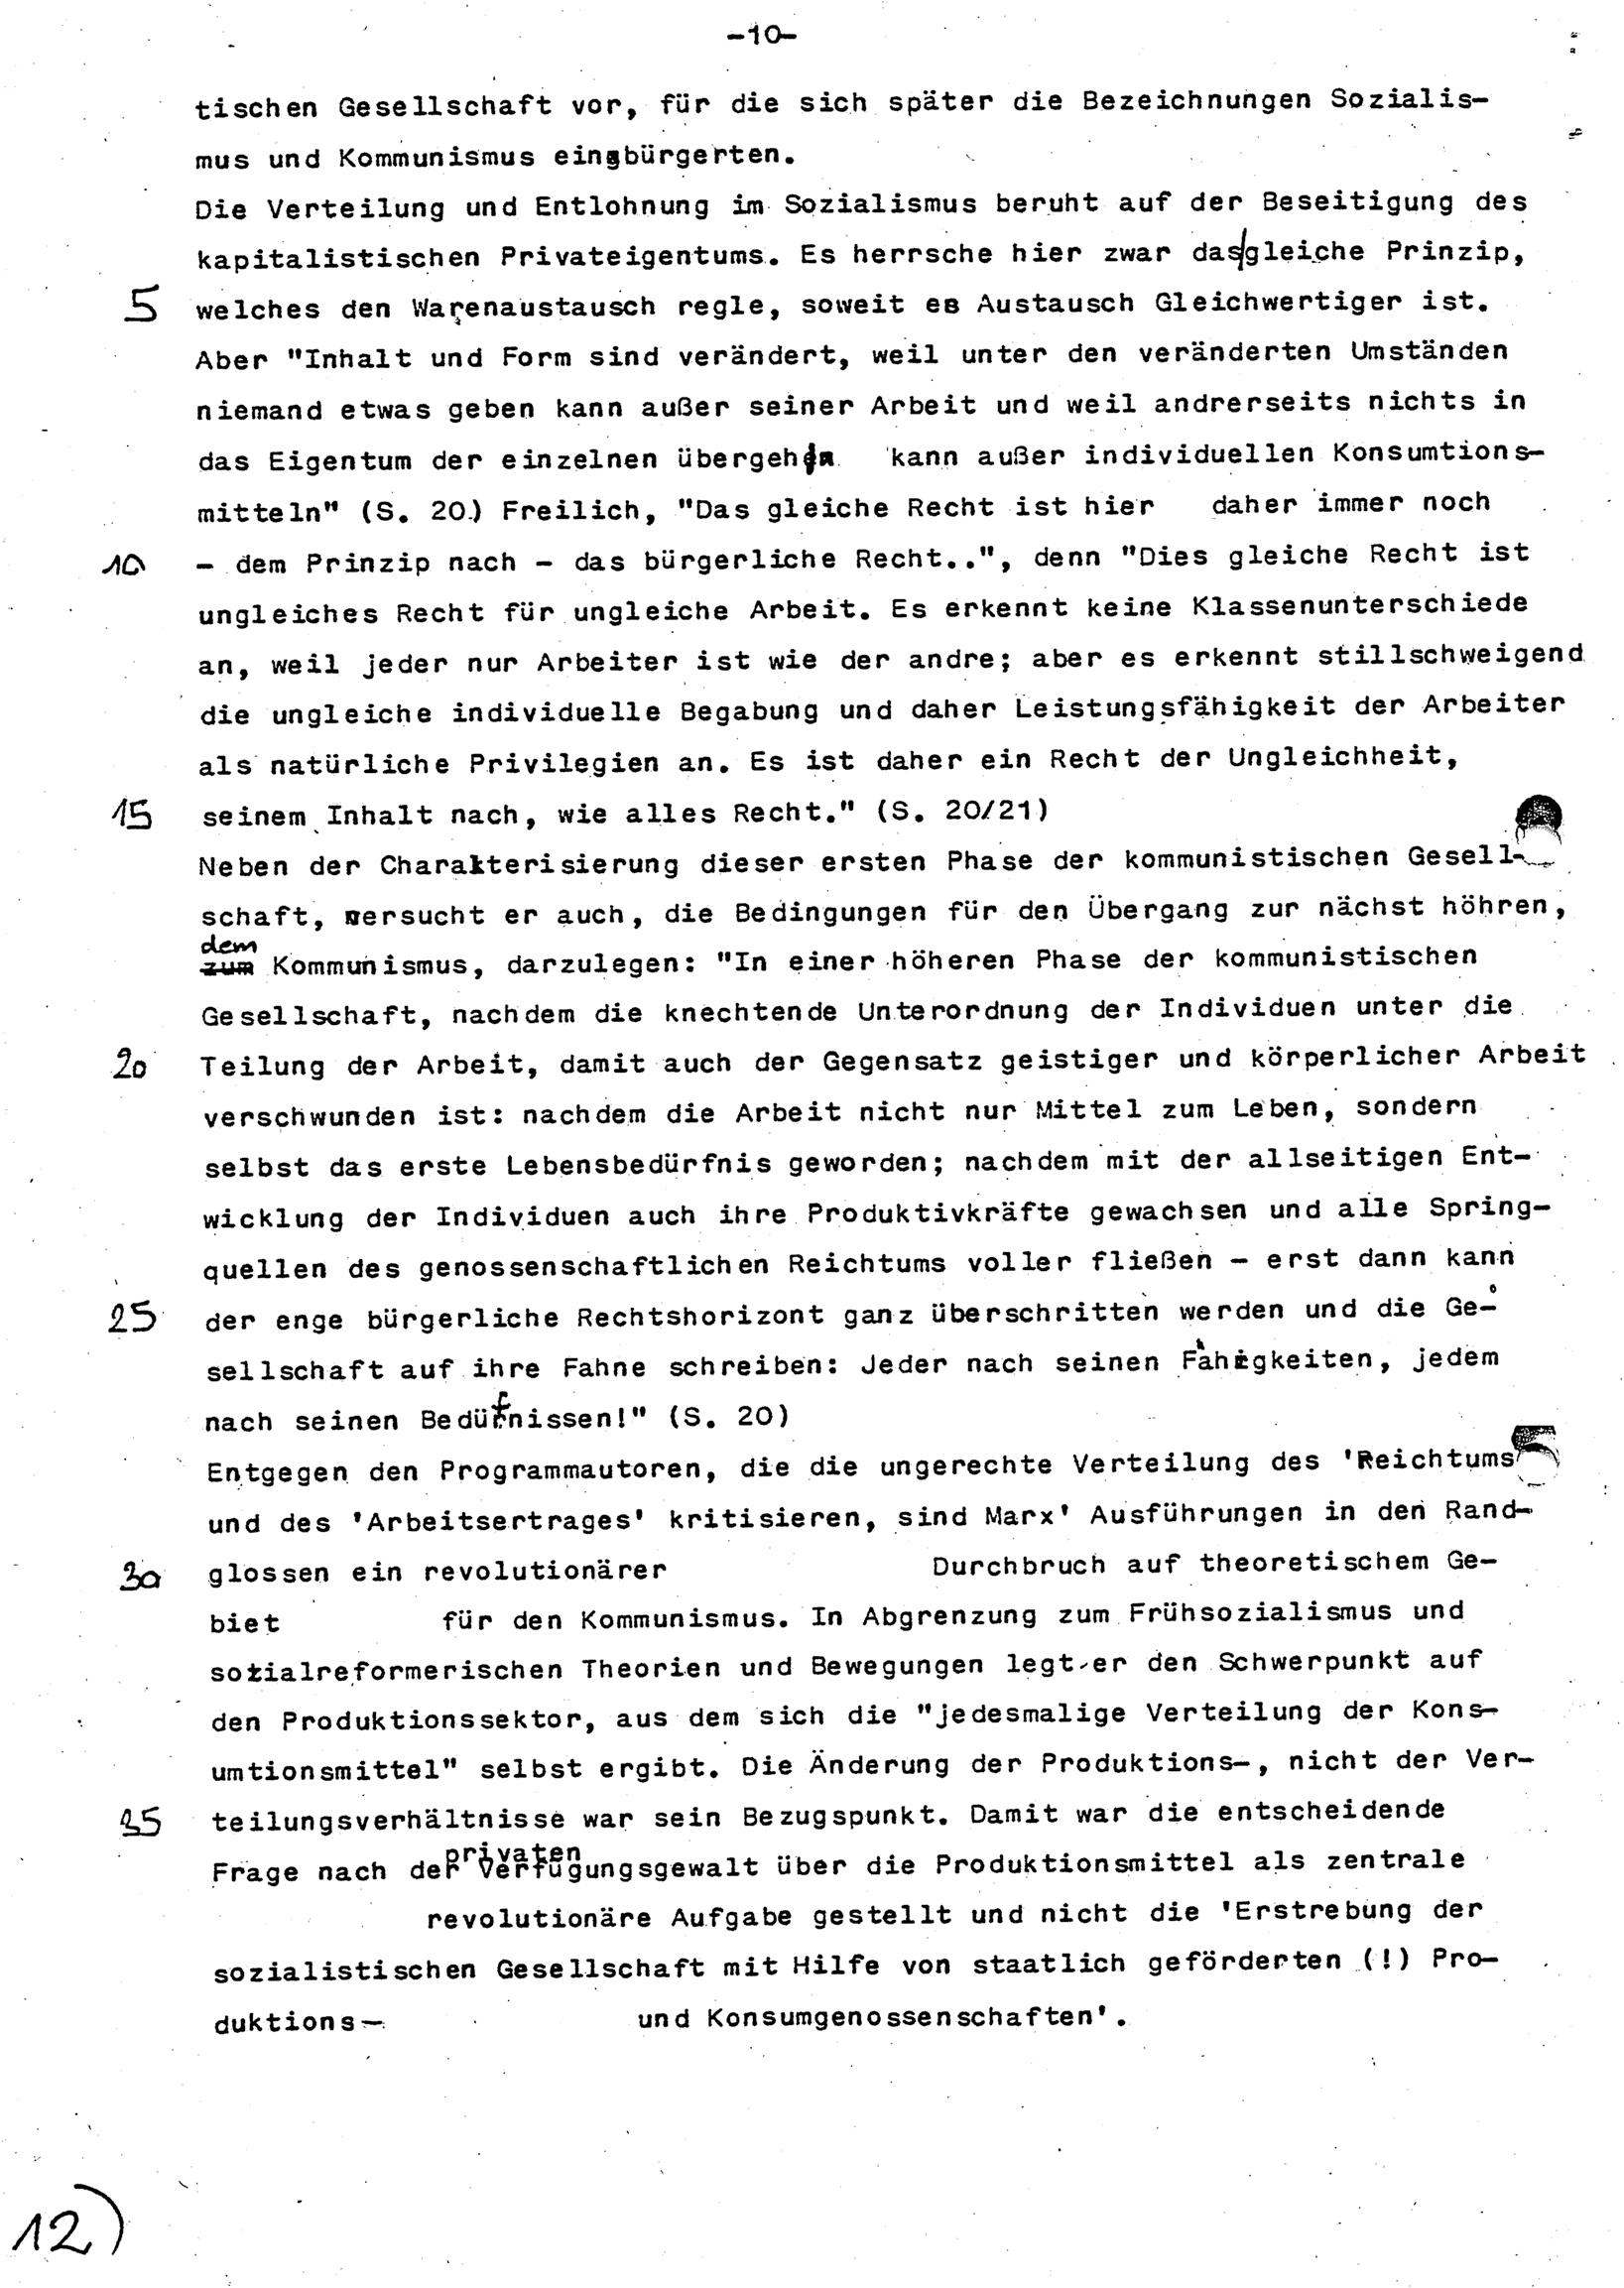 Ulm_KGU_Arbeitsheft_19830425_015_015